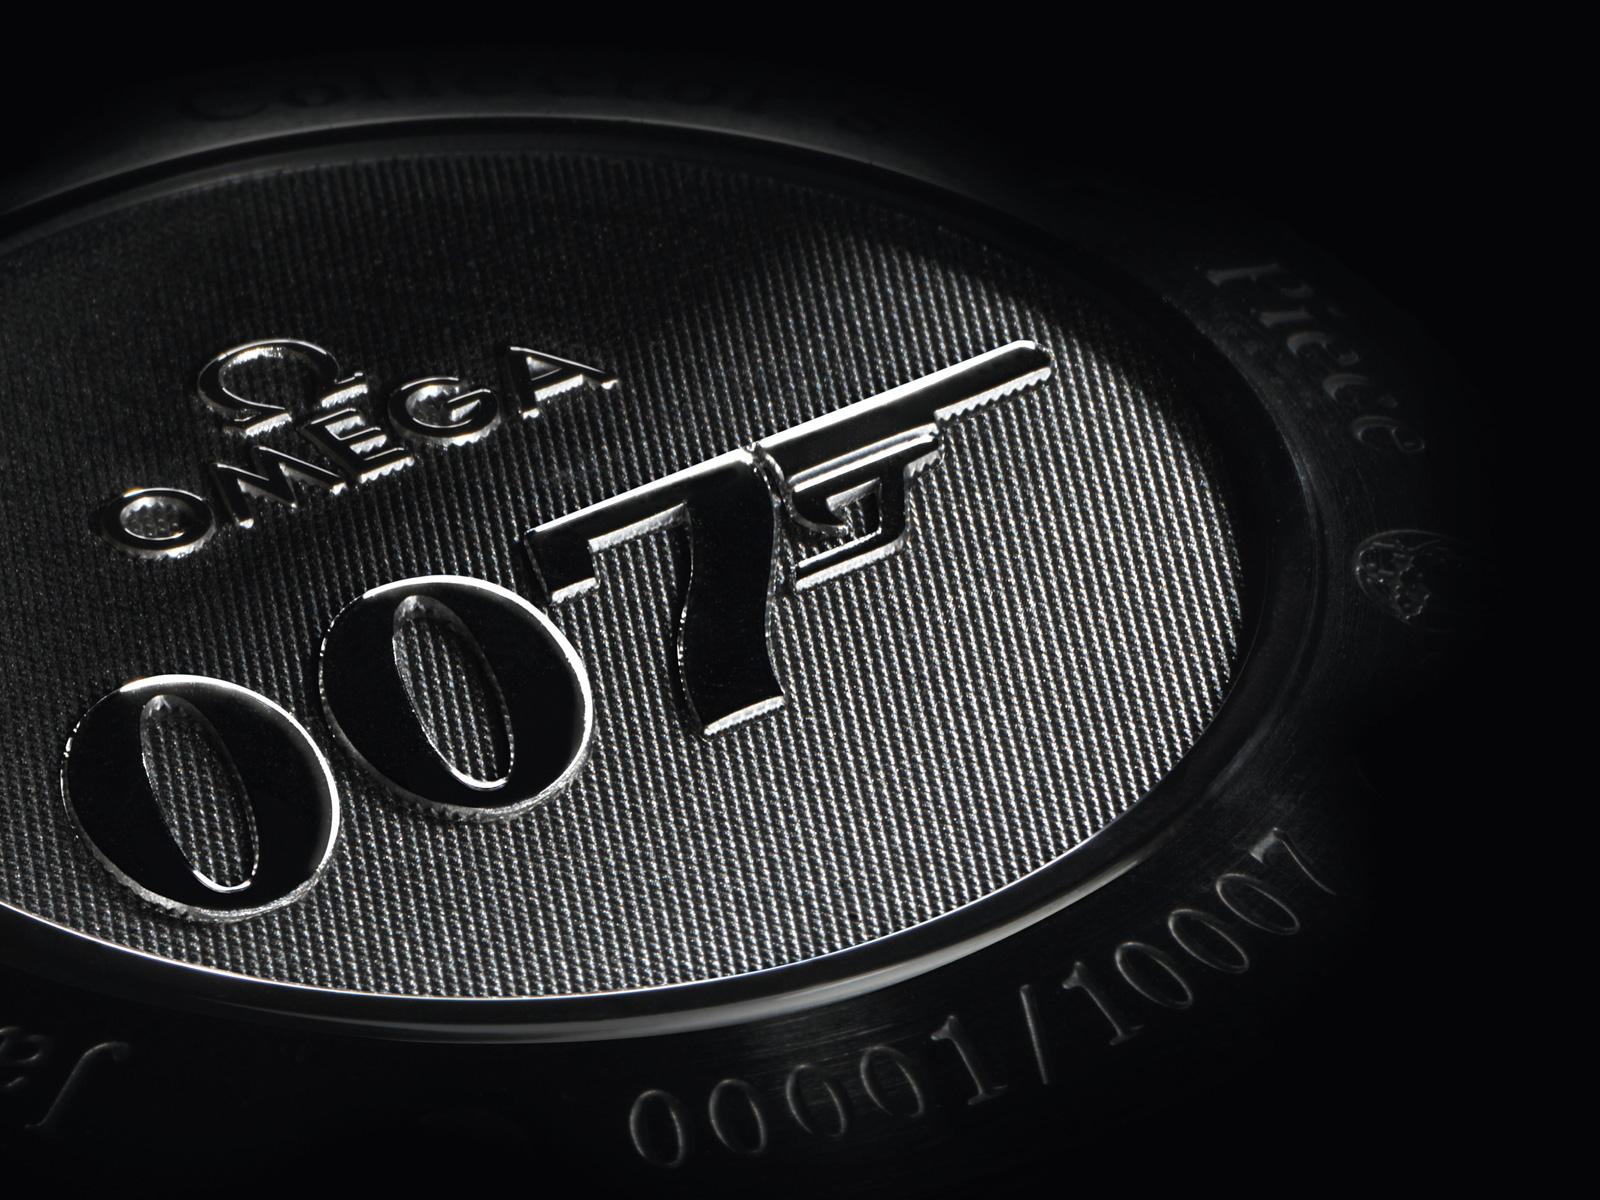 Omega Seamaster Watch 007 Logo HD Desktop Wallpaper 1600x1200